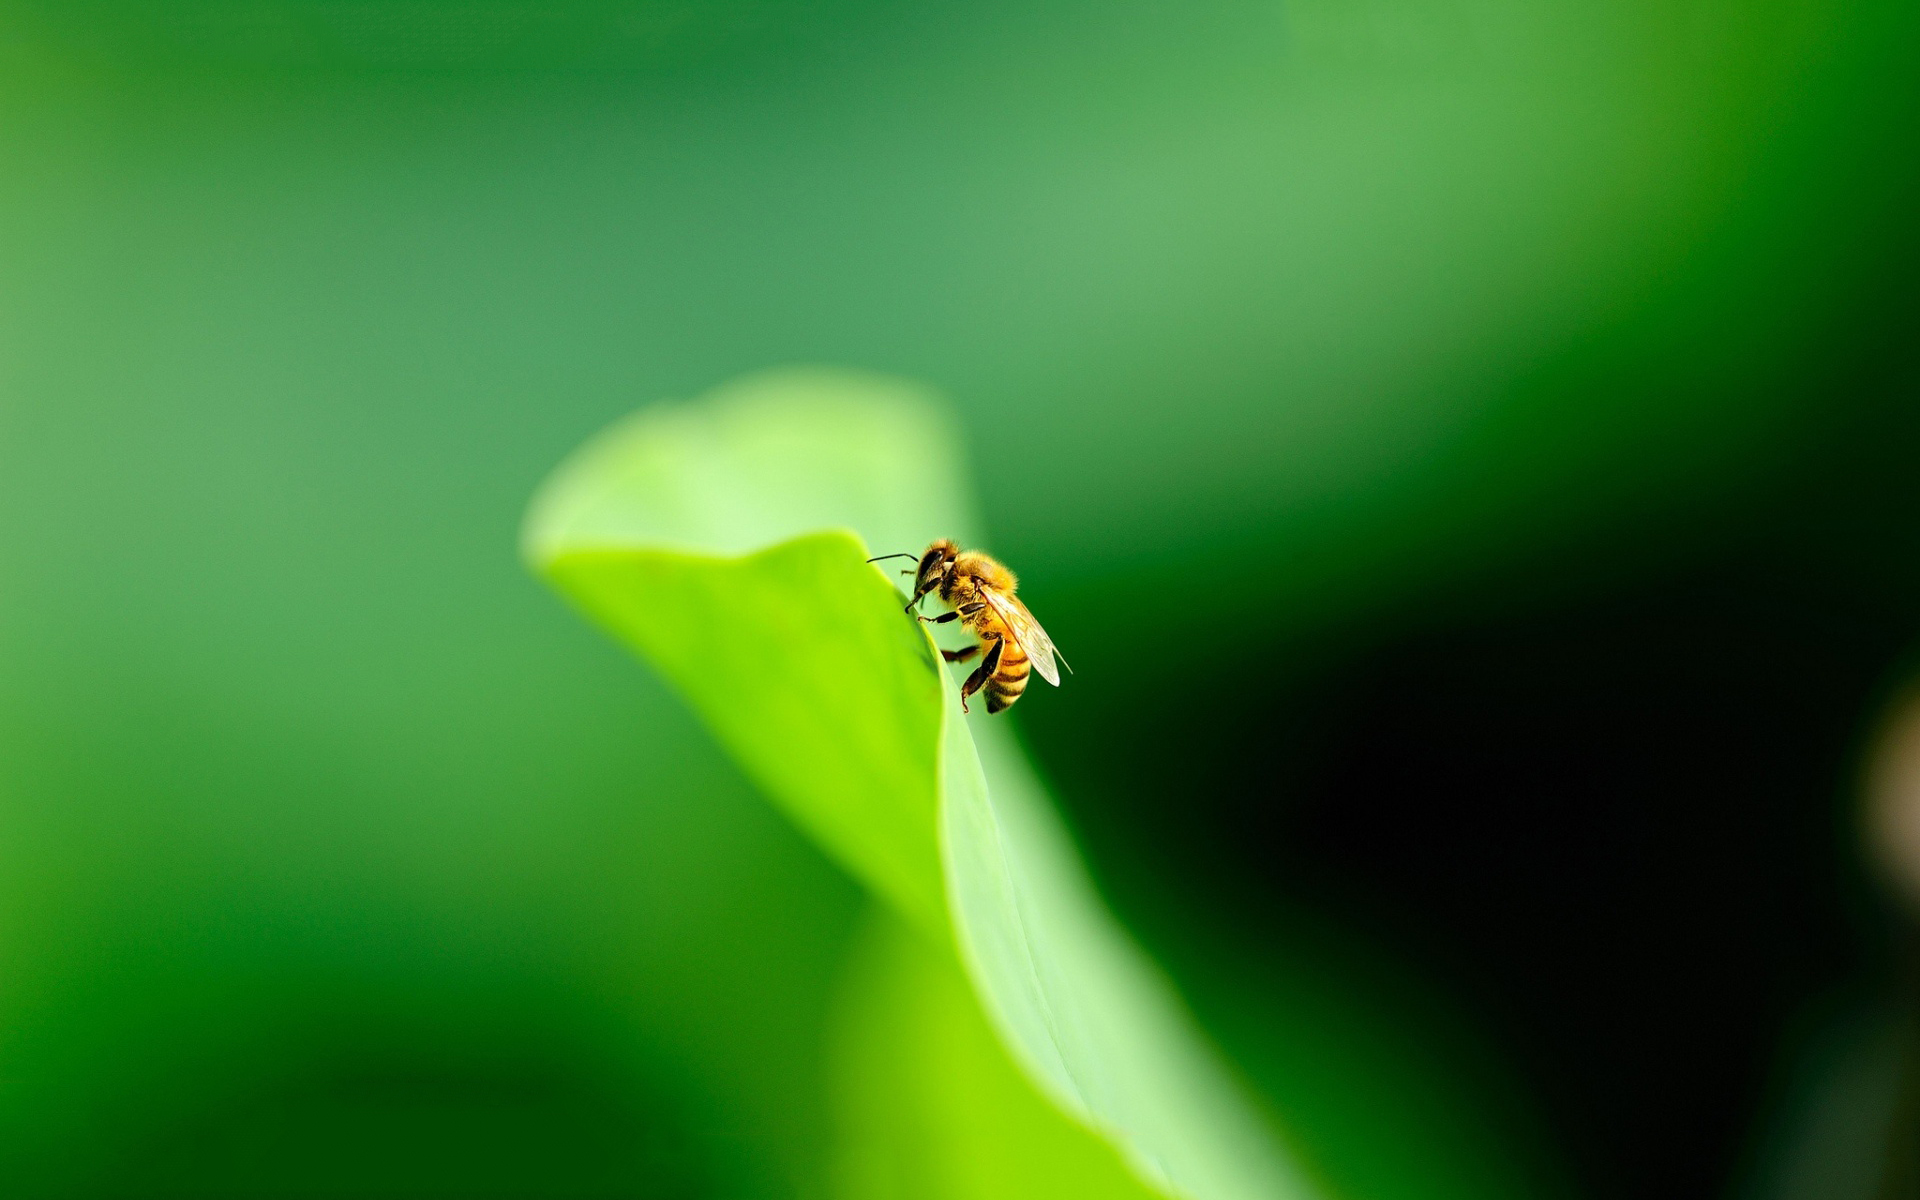 bees wallpaper hd